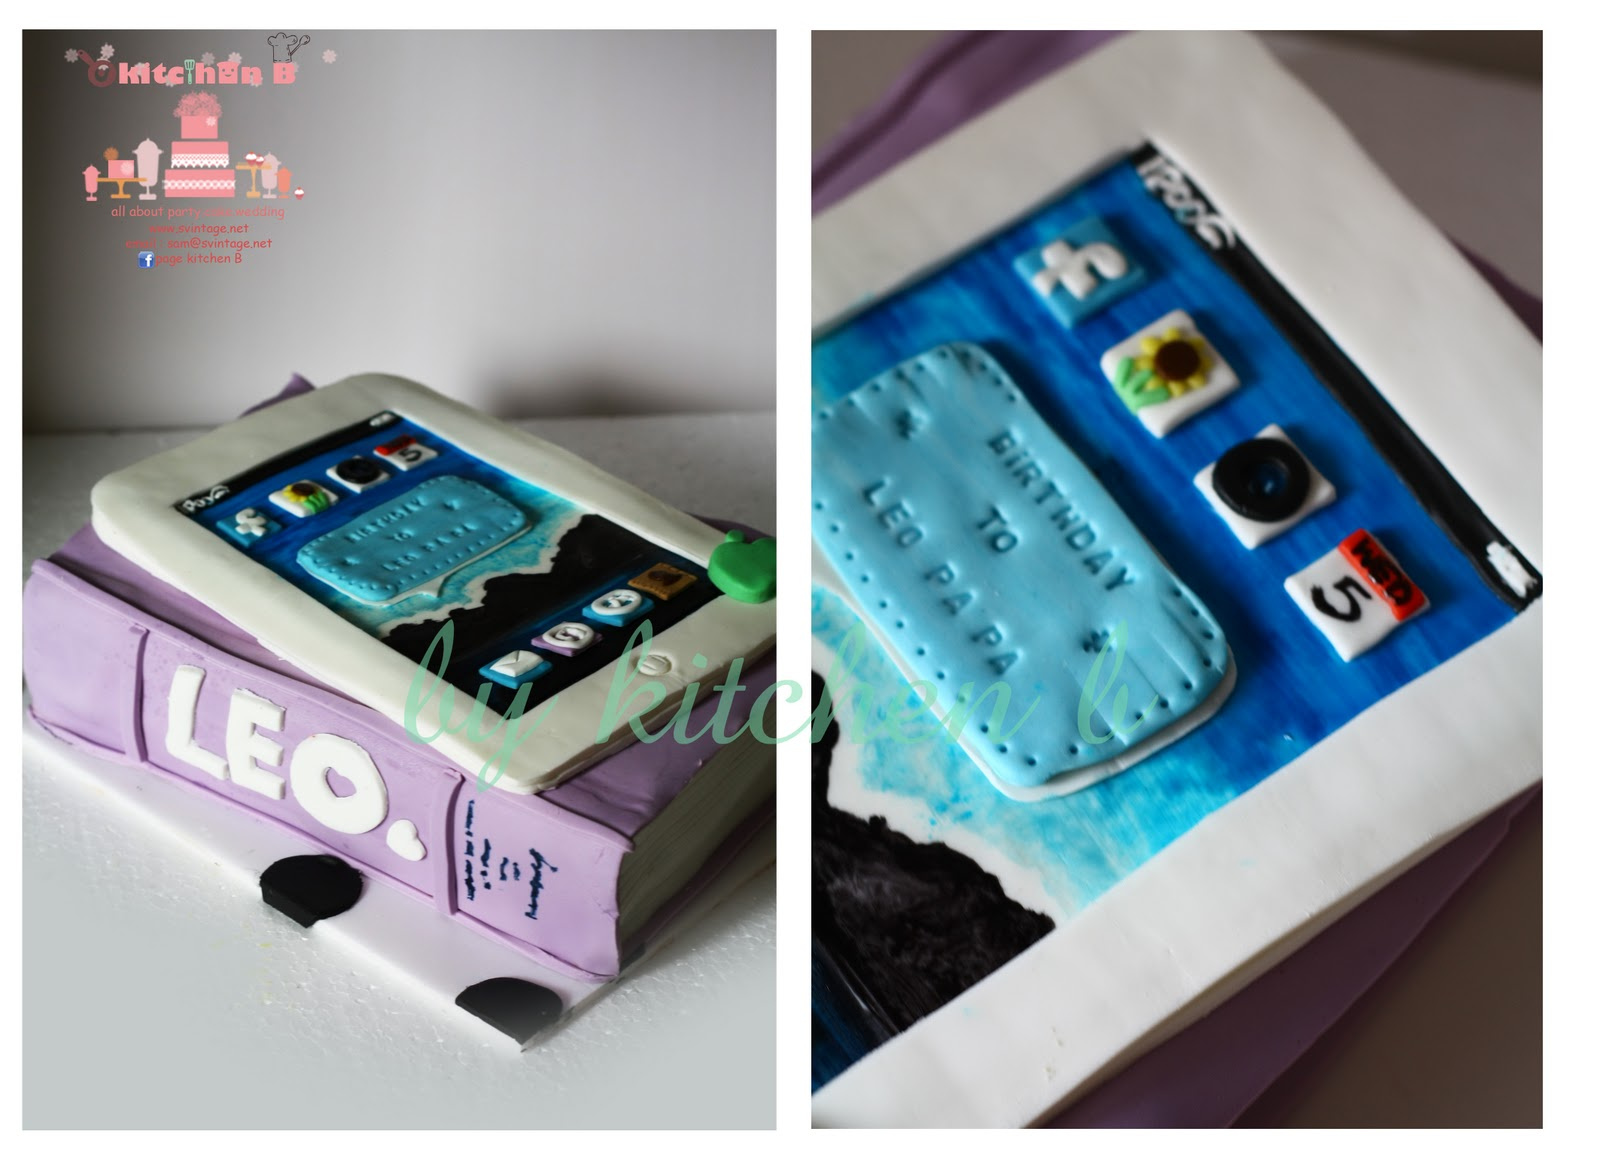 Kitchen B Ipad Cake